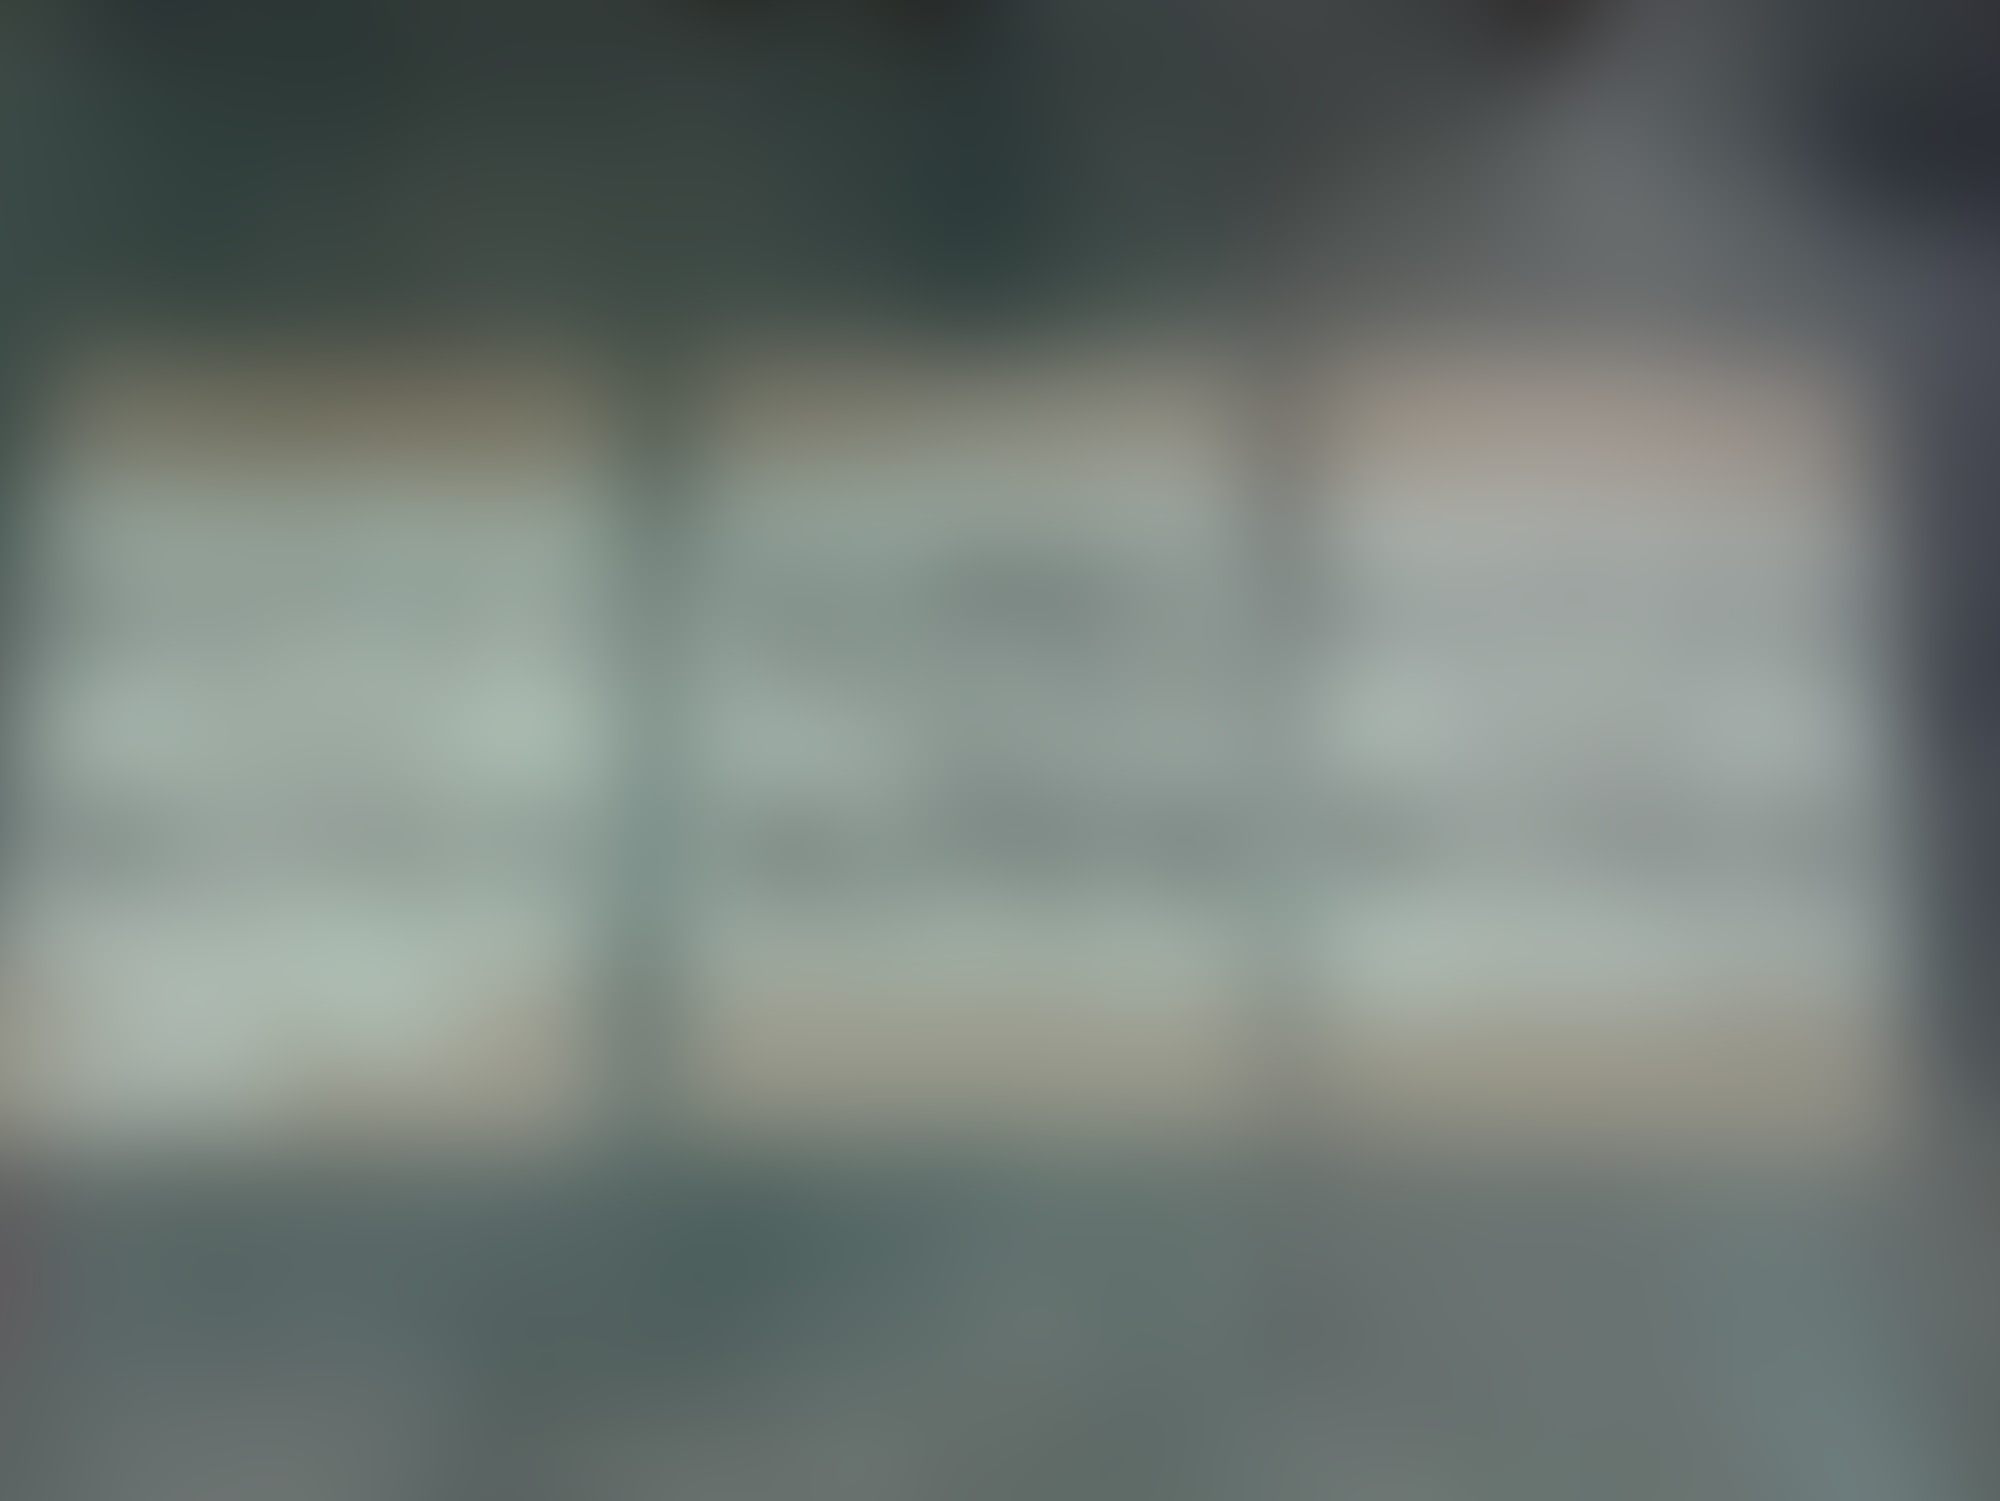 20140307 161808 resized orig autocompressfitresizeixlibphp 1 1 0max h2000max w3 D2000q80s6d01c5af65e2218fdfb02cbec4c7249b